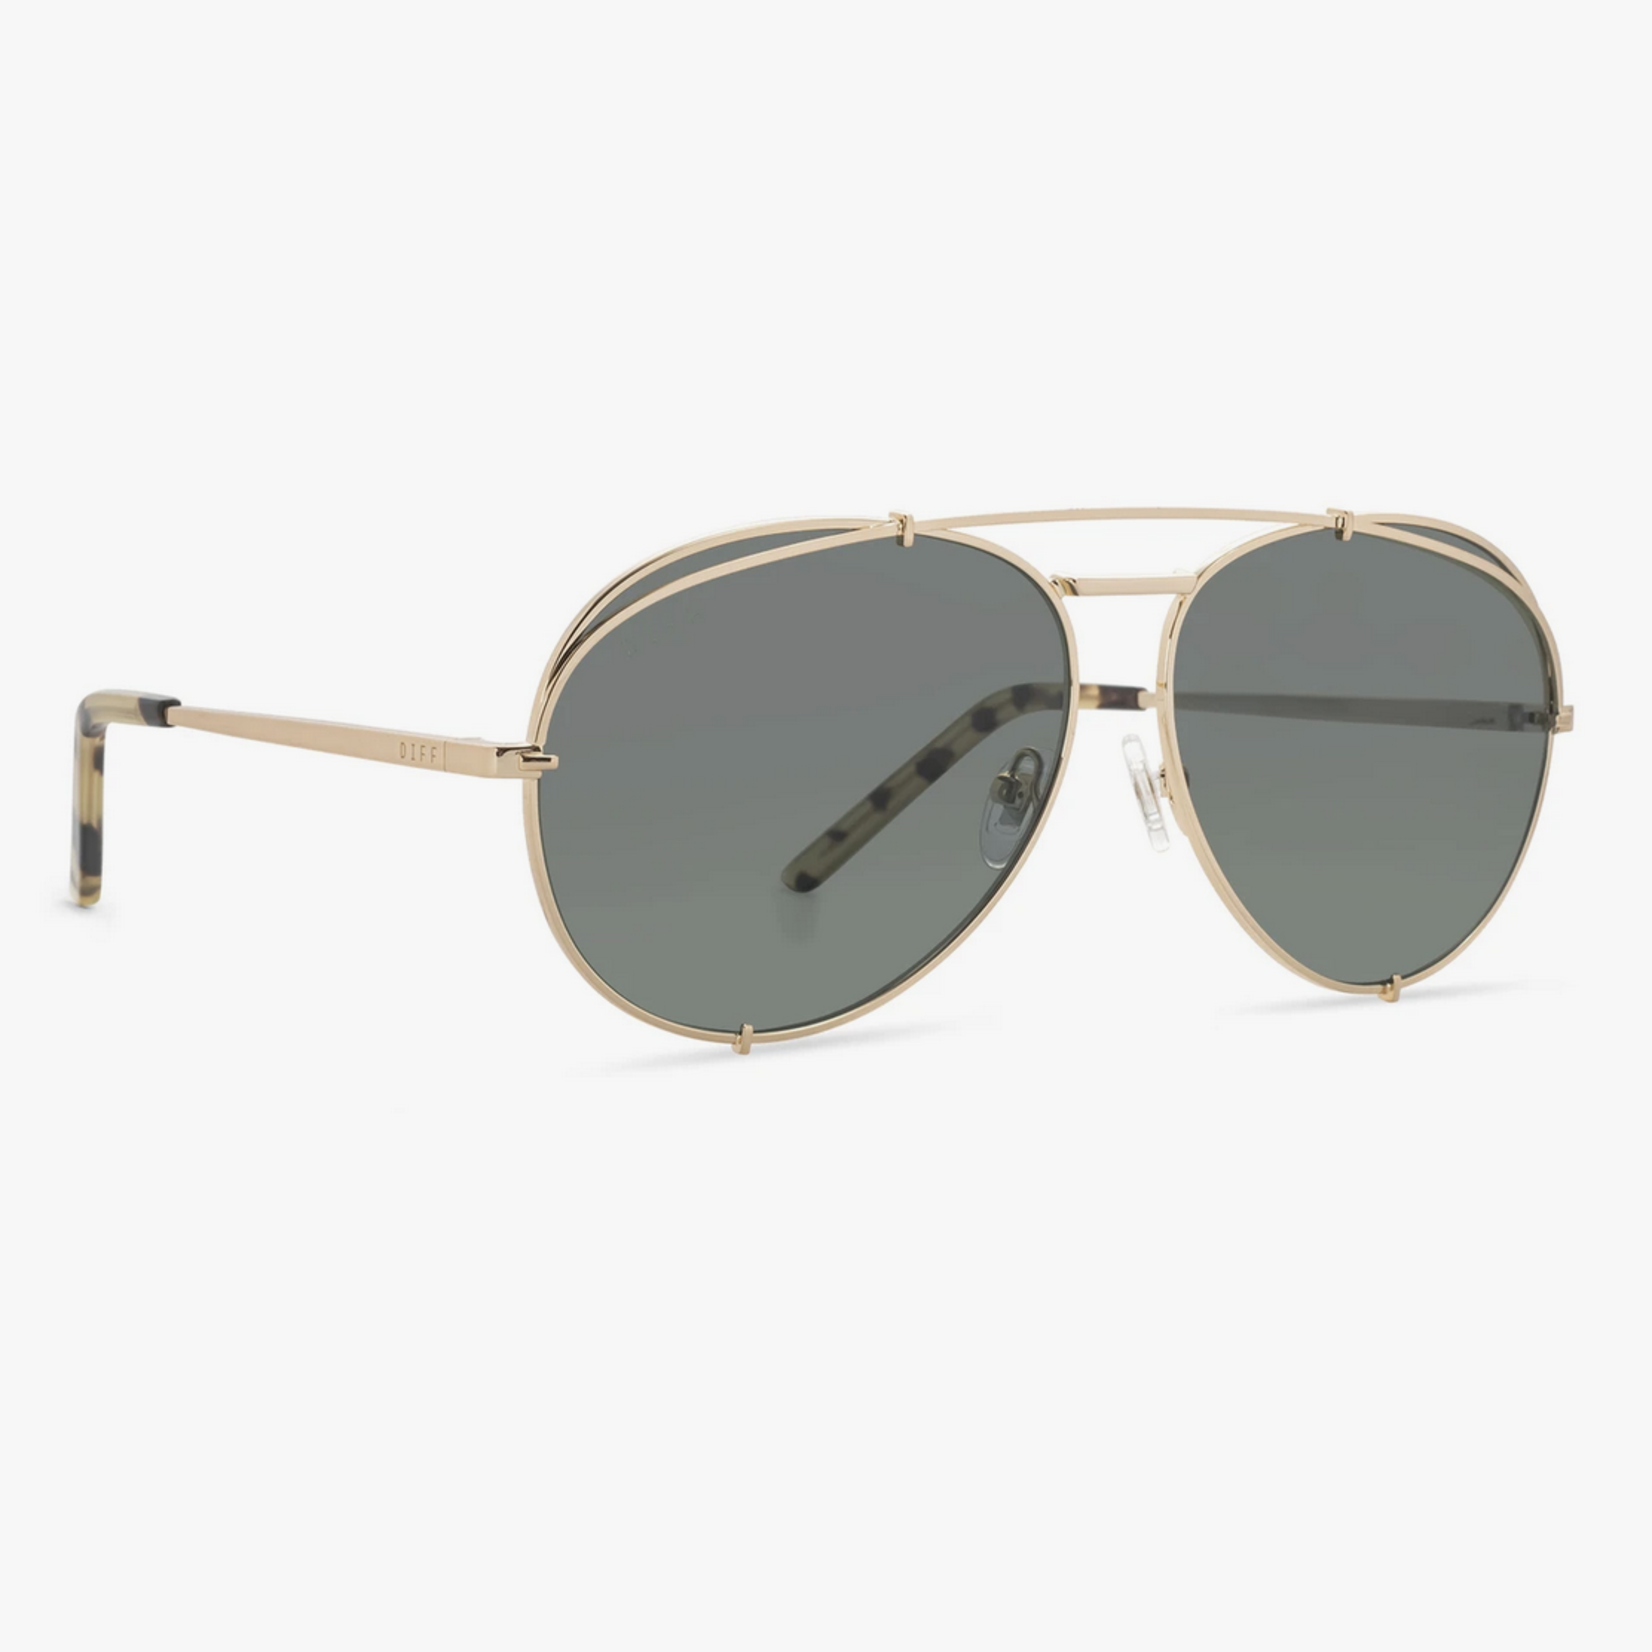 Diff - Koko sunglasses